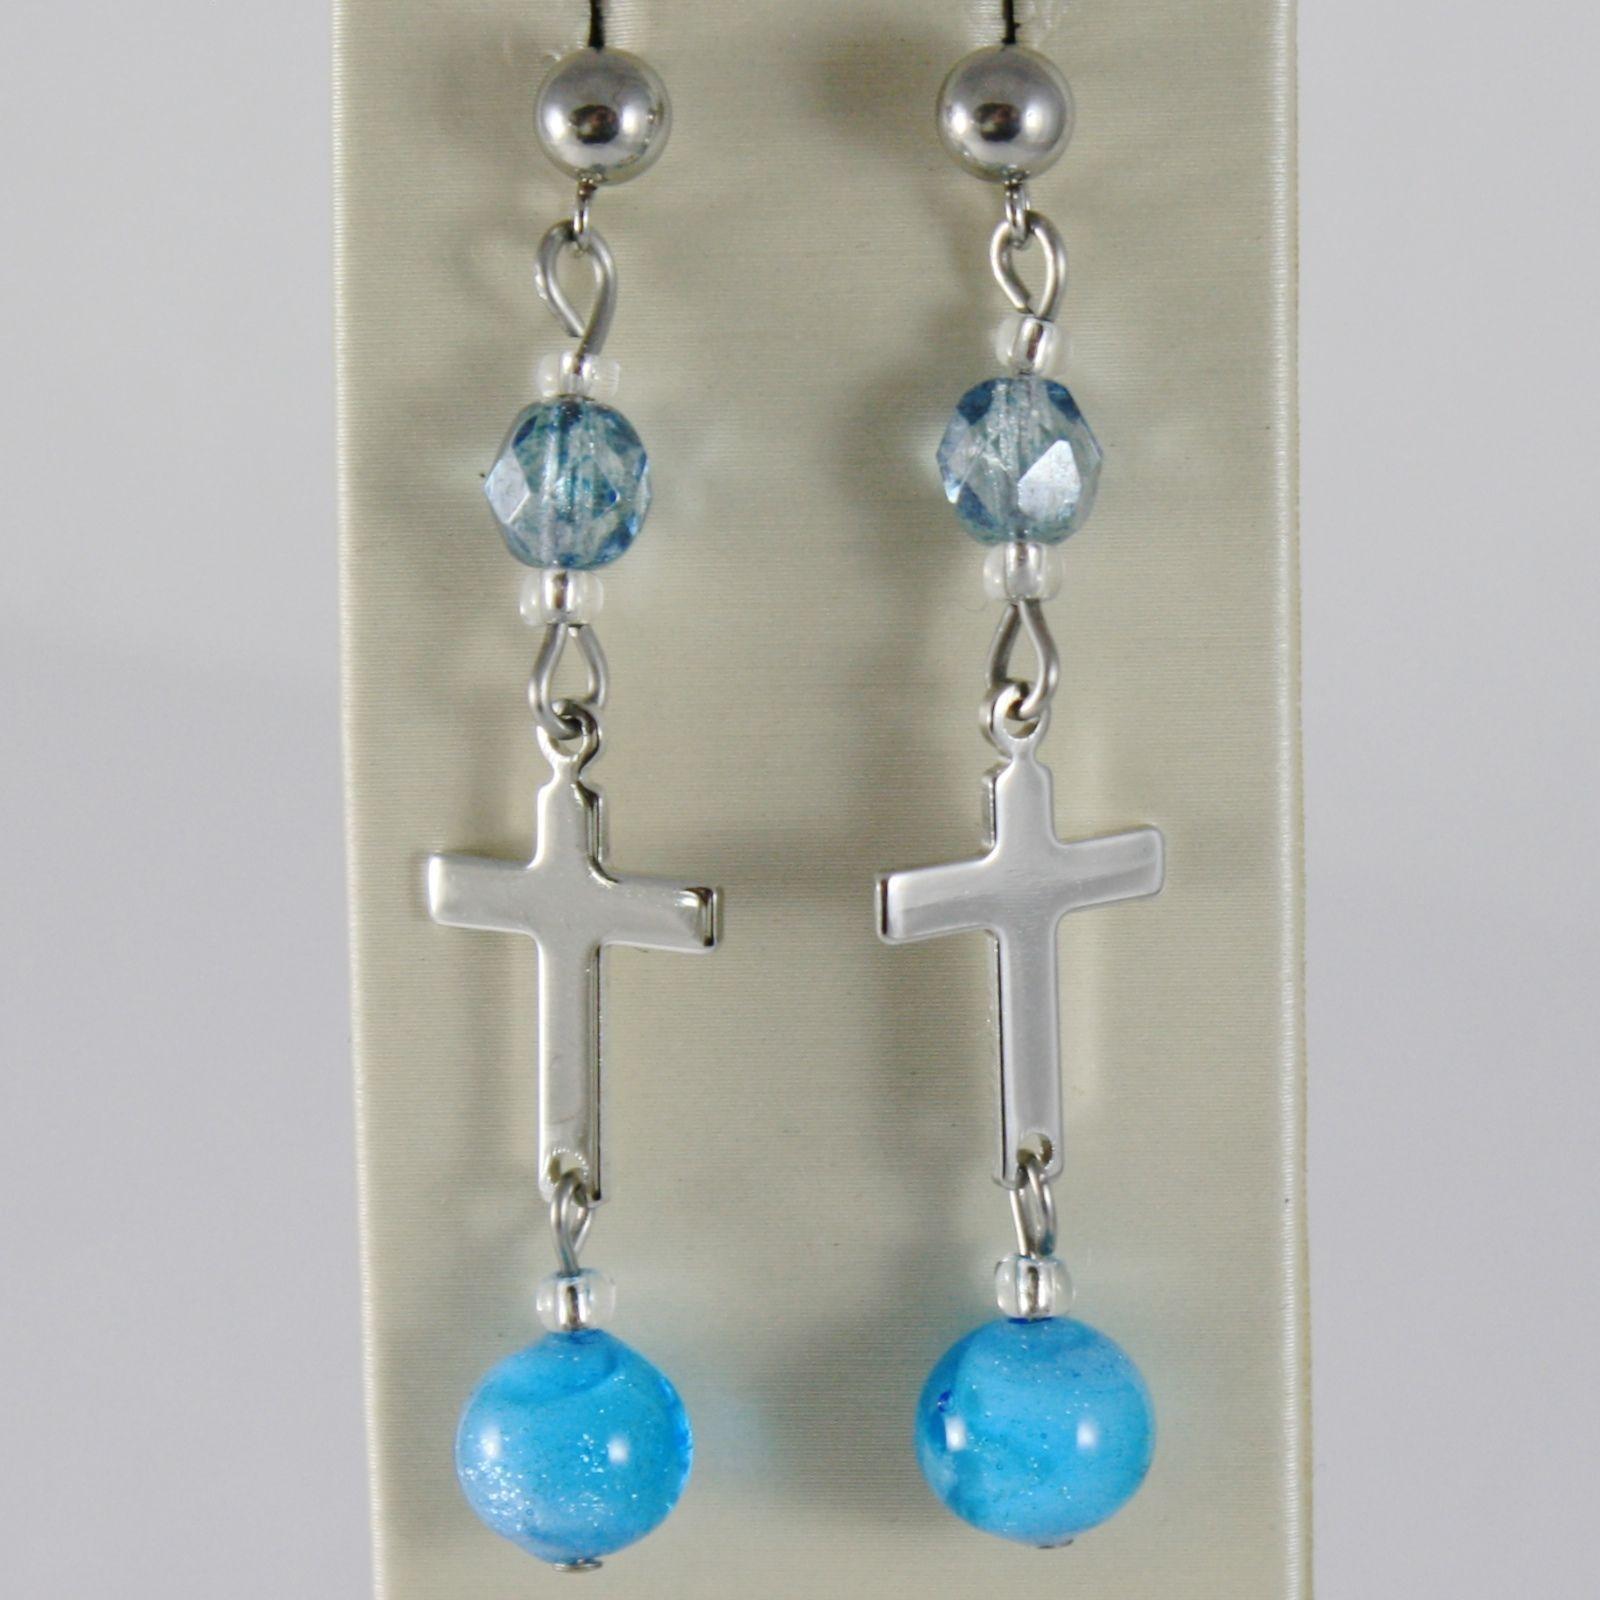 EARRINGS ANTICA MURRINA VENEZIA WITH MURANO GLASS BLUE LIGHT BLUE AND CROSS